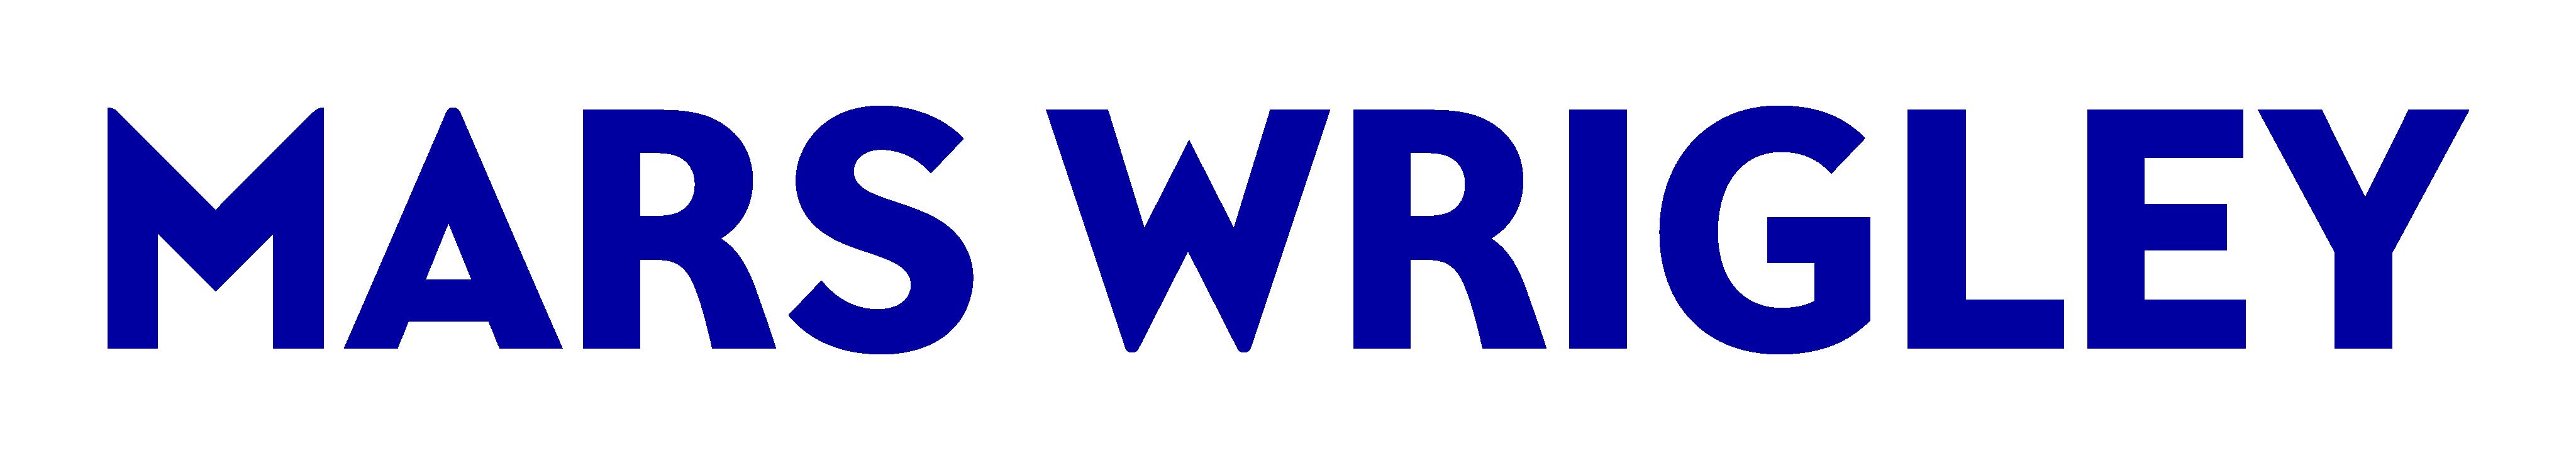 Wrigley Confections ČR, kom. spol.